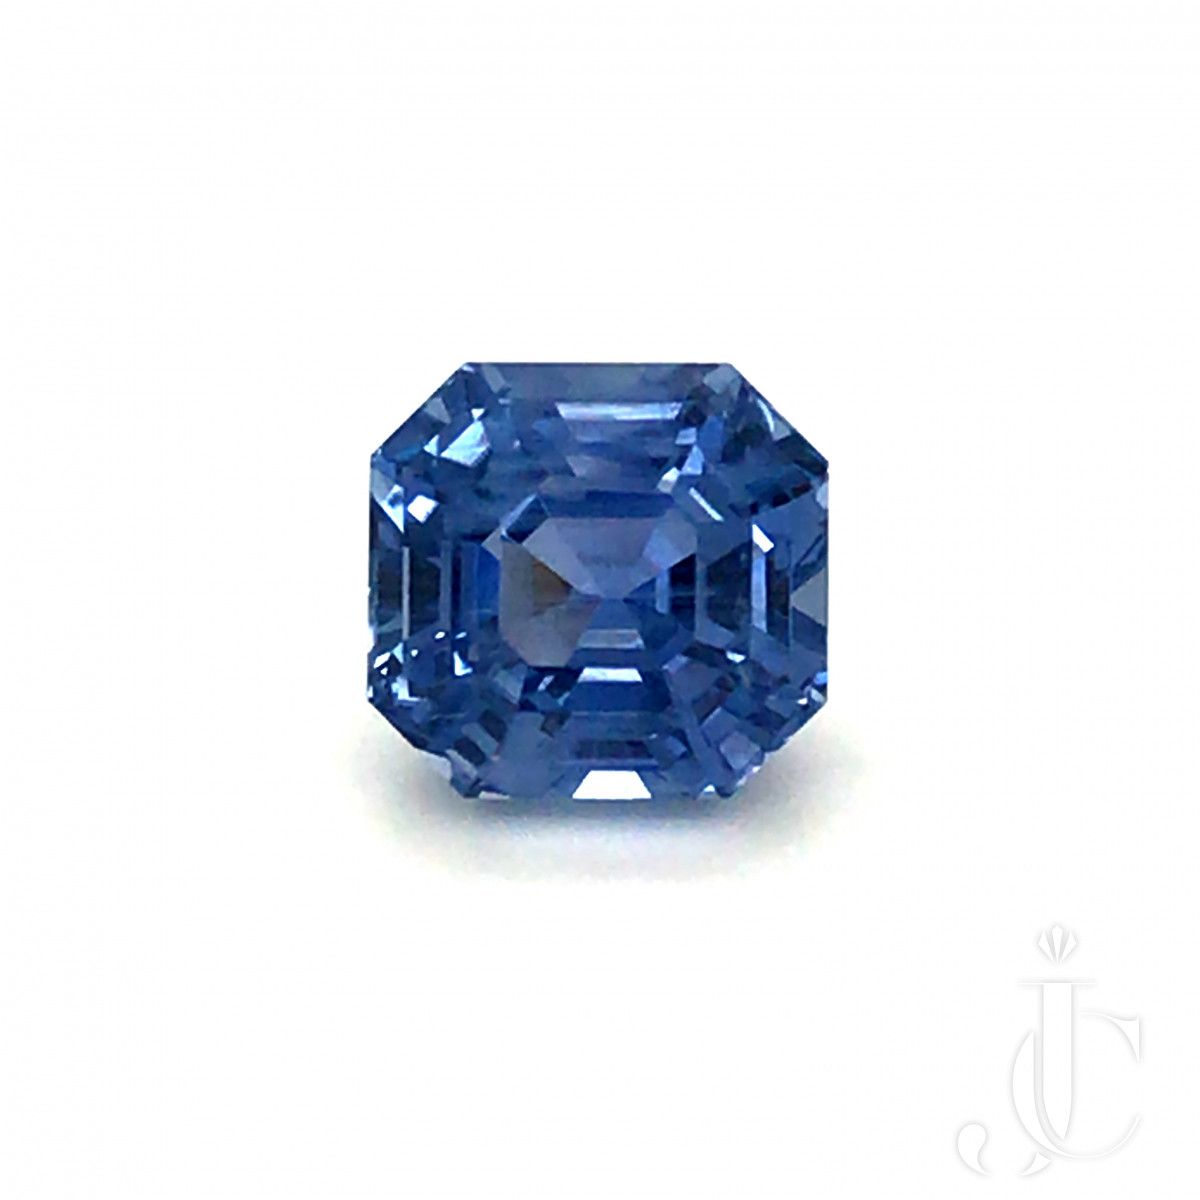 Natural no heat octagon / asscher cut Ceylon Sapphire 9.06ct blue with DSEF lab report